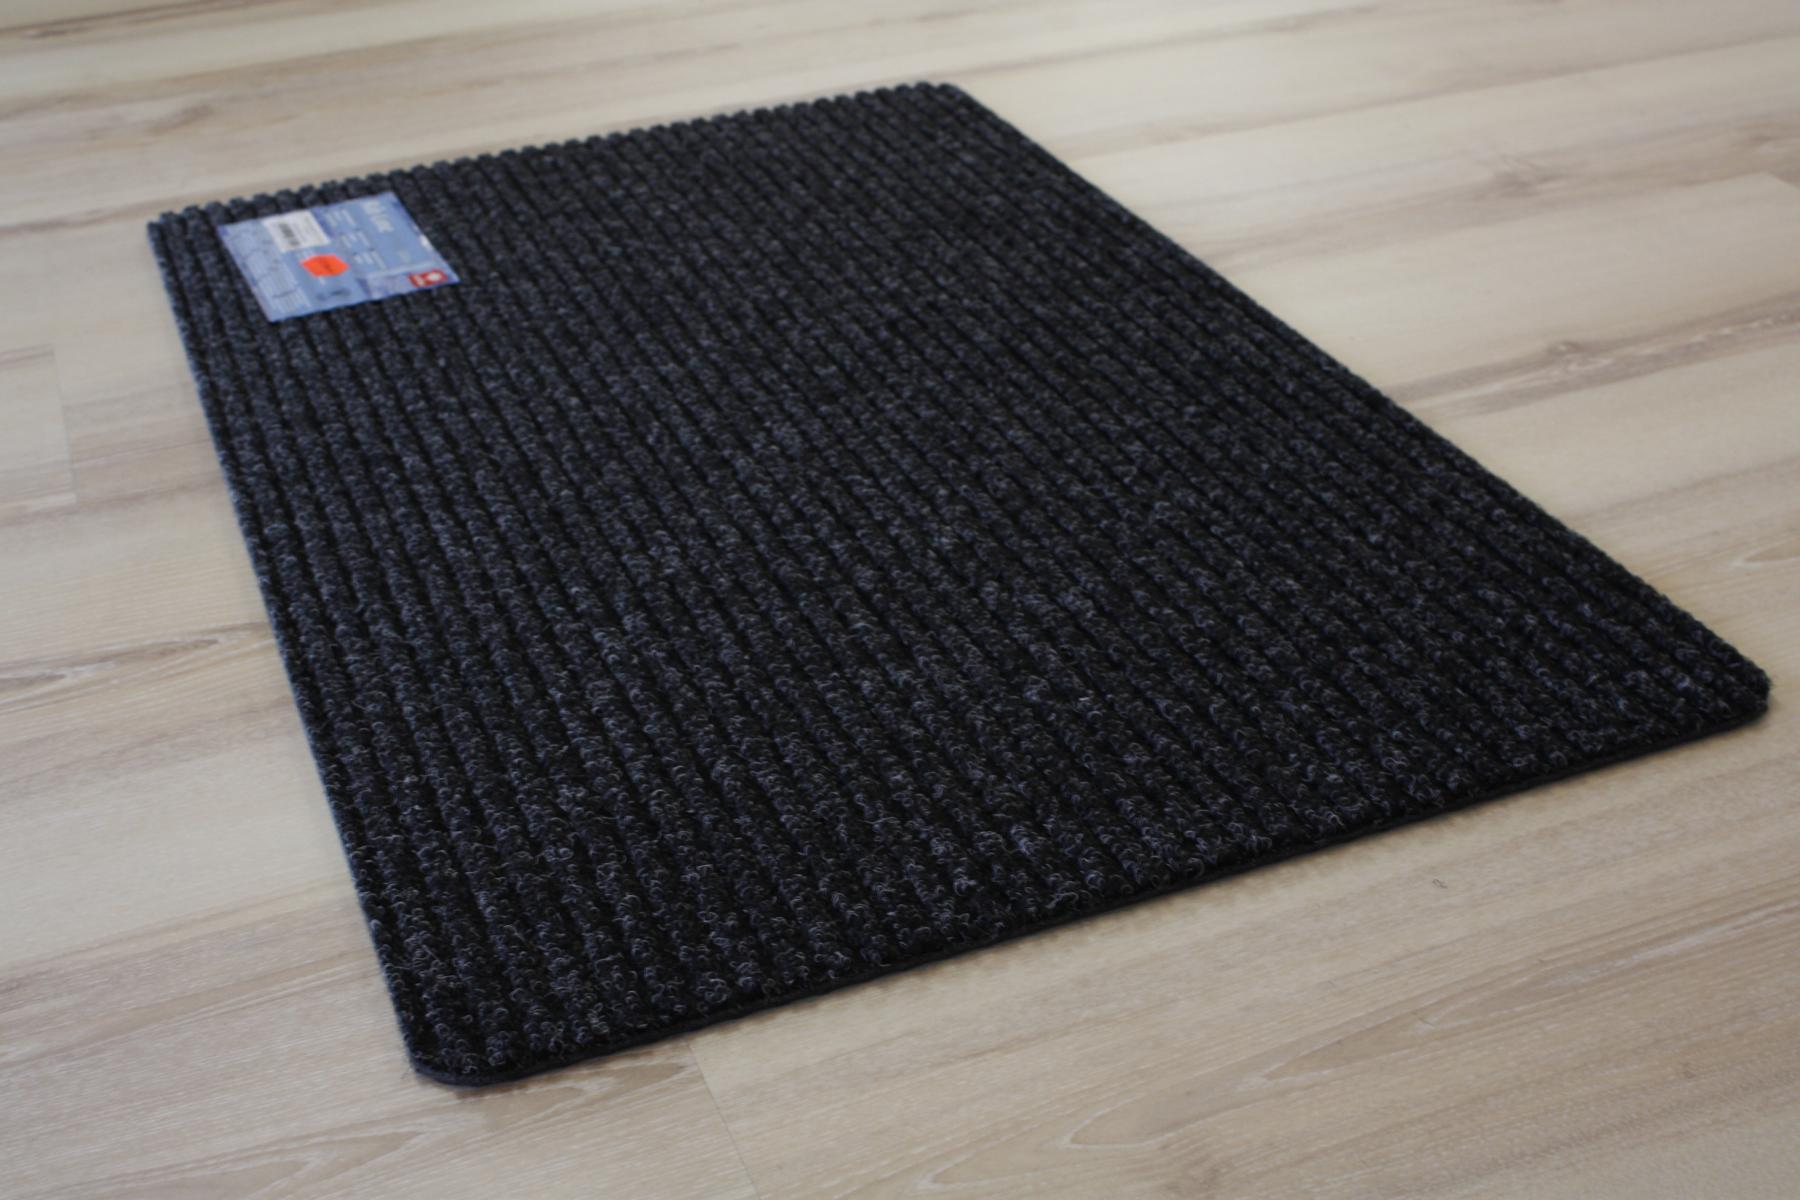 fu matte t rmatte rib line 48 schwarz grau 40x60 cm ebay. Black Bedroom Furniture Sets. Home Design Ideas